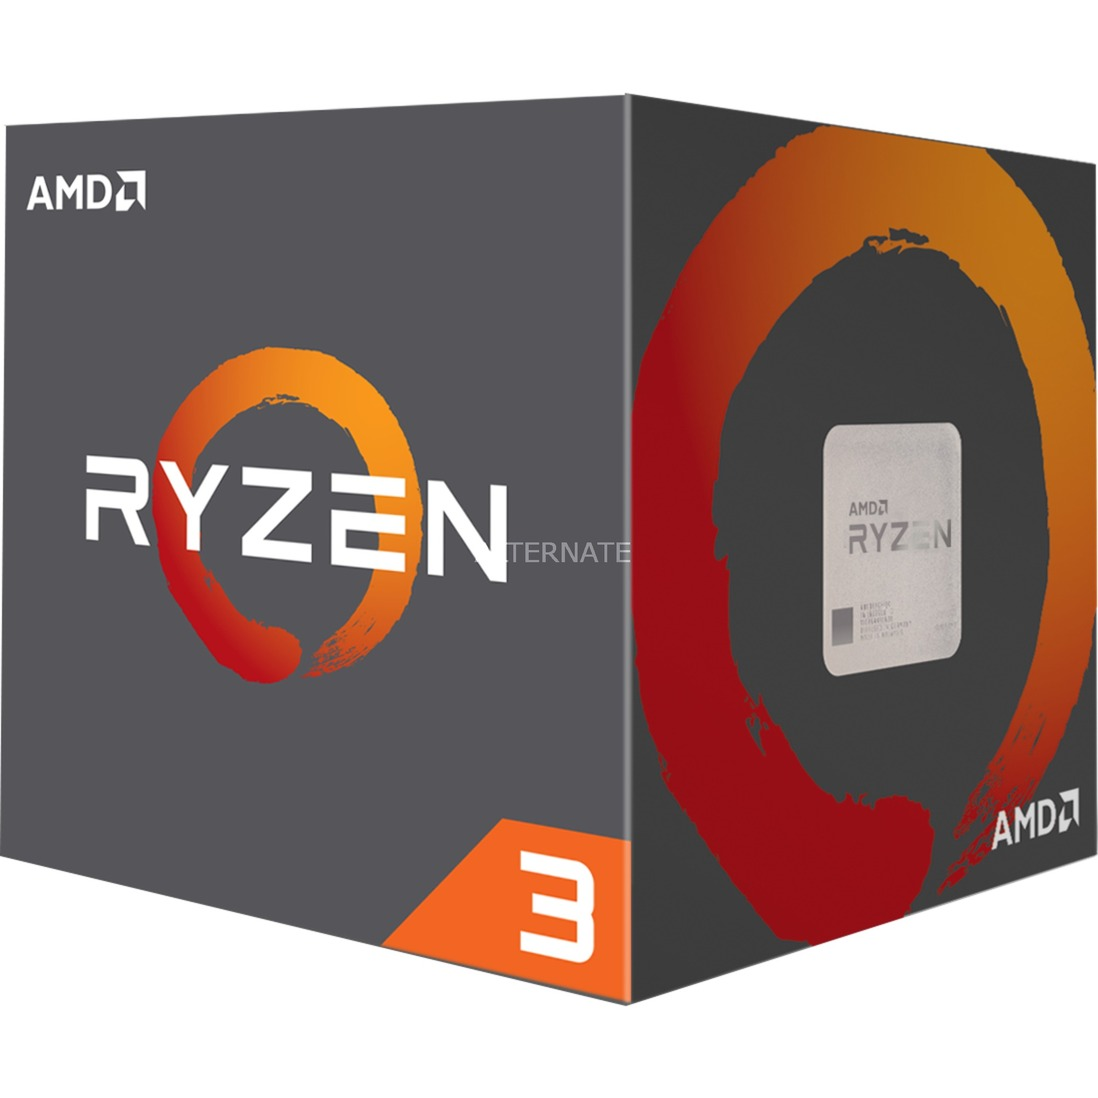 Ryzen 3 1300X procesador 3,5 GHz Caja 8 MB L3